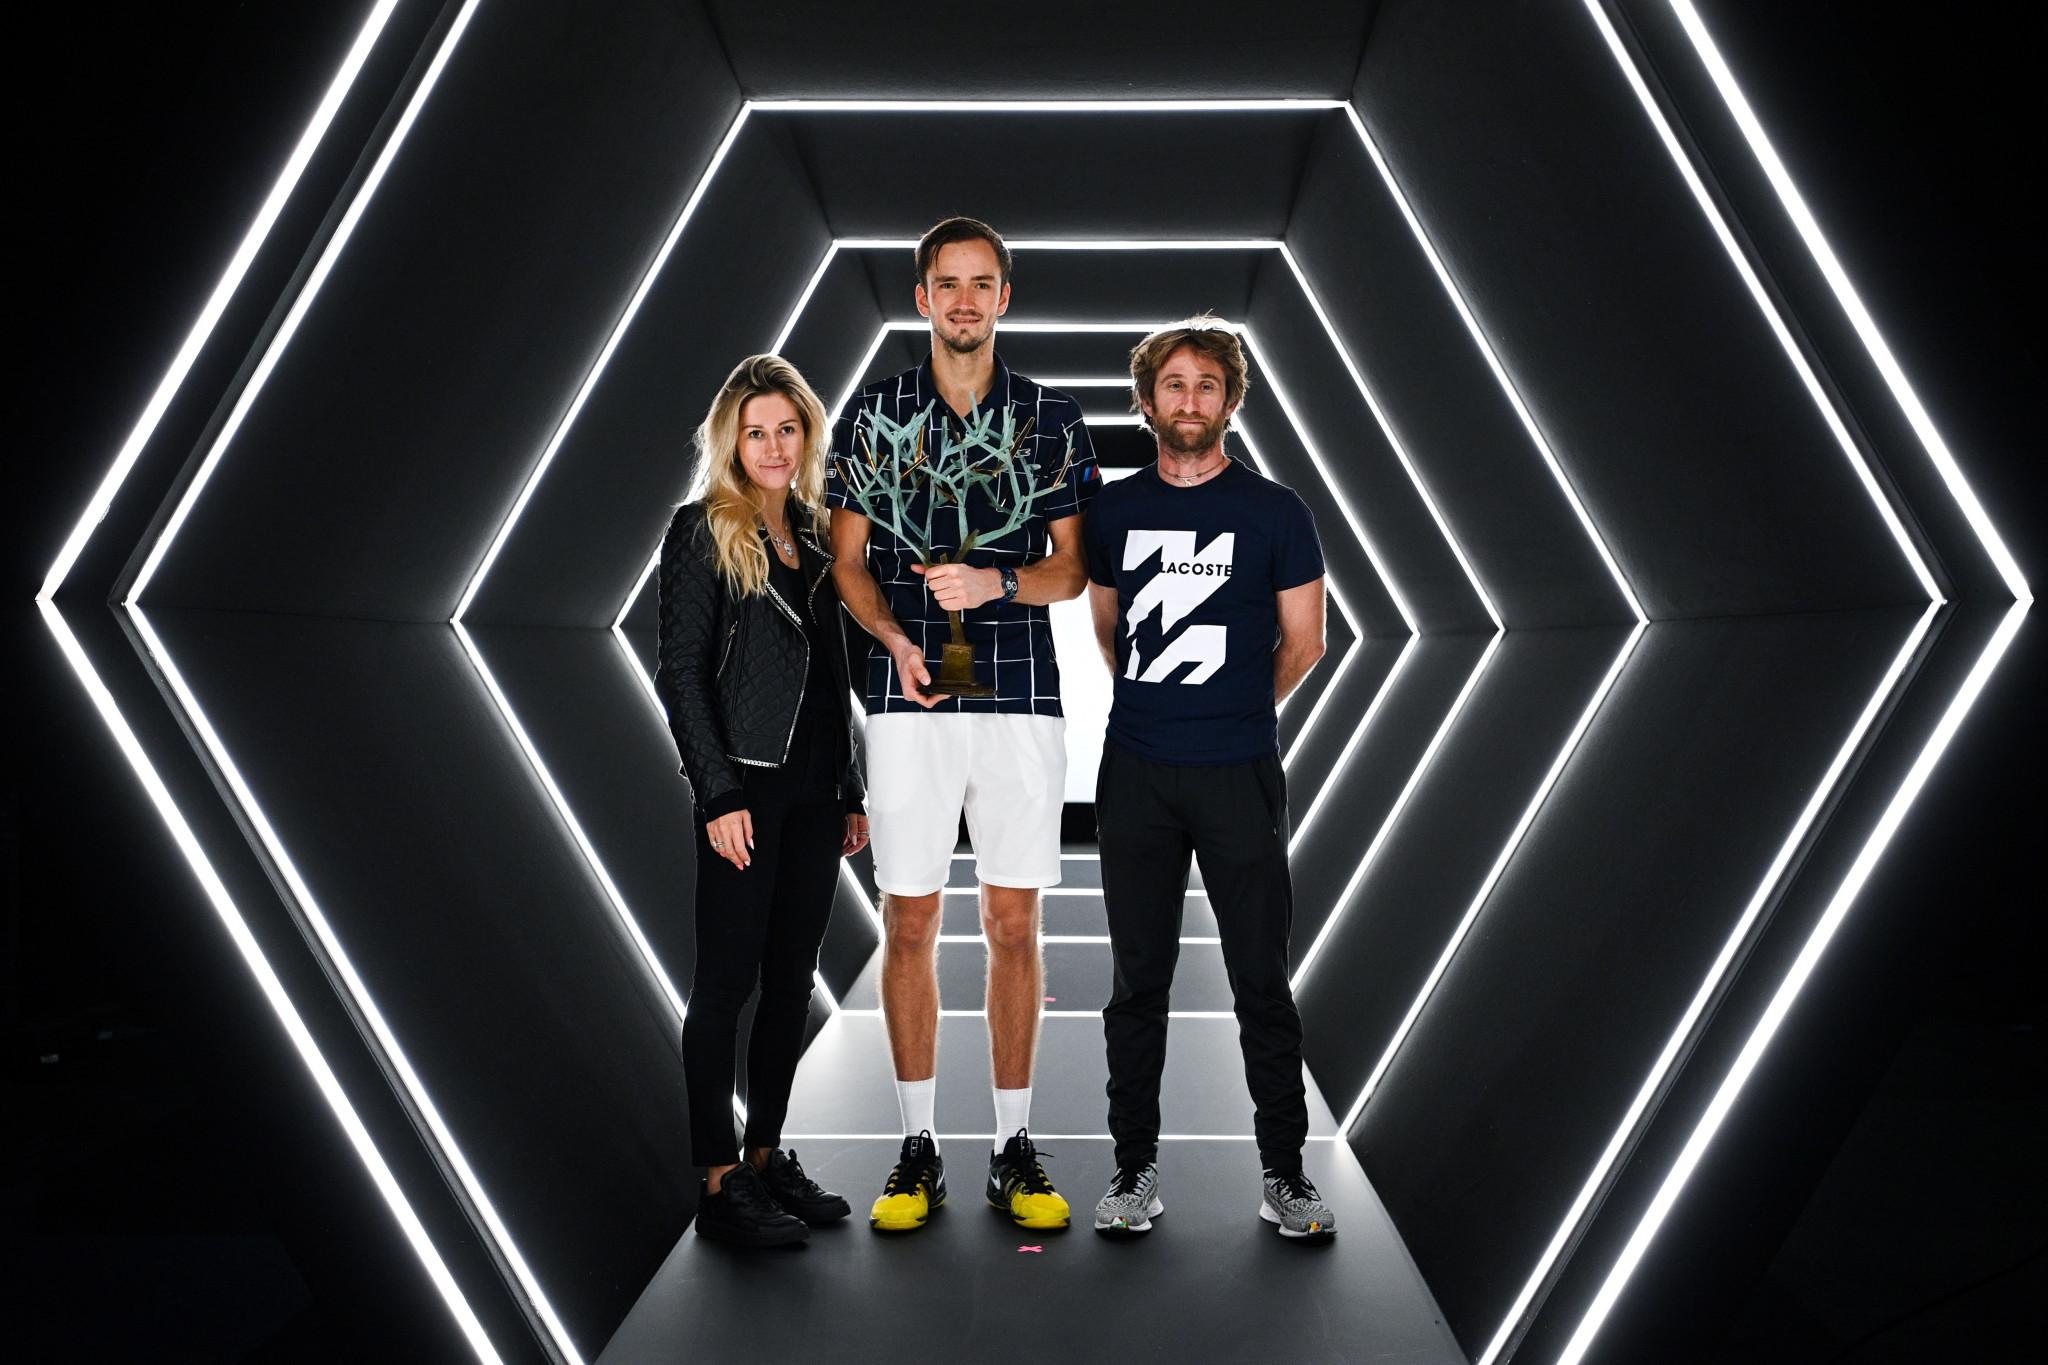 Gutsy Medvedev ends Zverev's winning run to clinch Paris Masters title